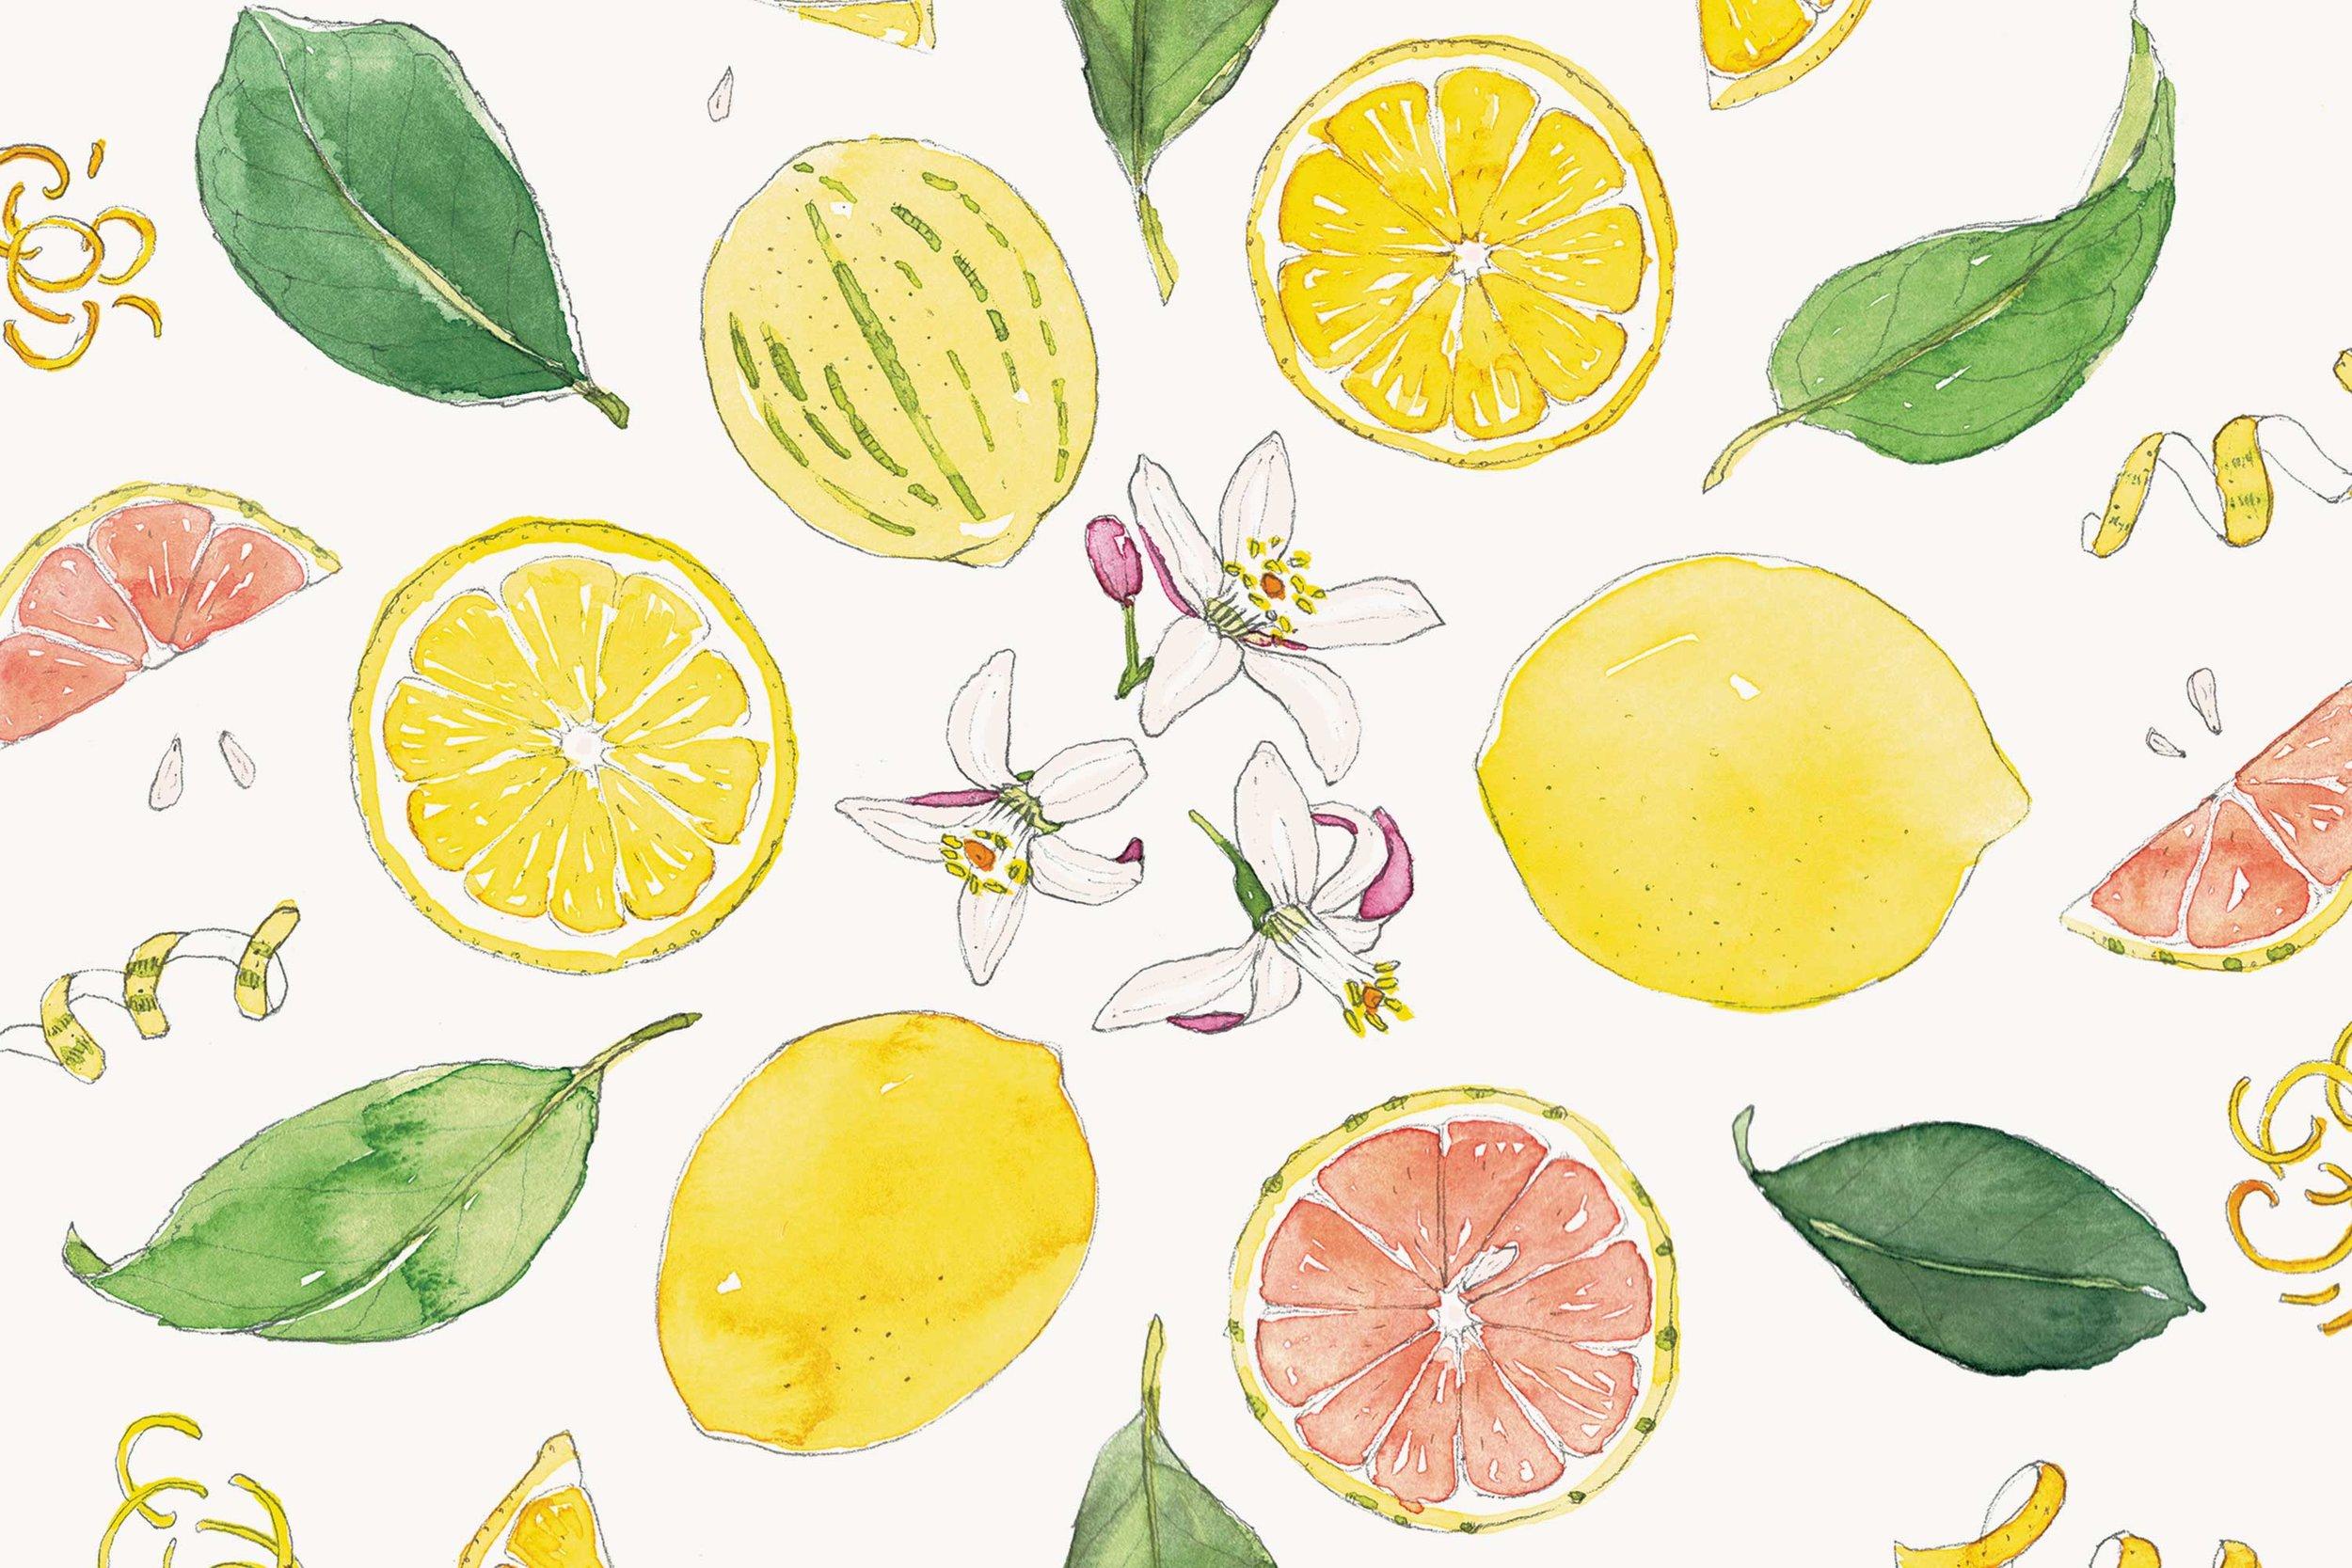 Lemons-mandala-illustration-by-Erin-Ellis-Tampa-Bay-Times-Taste.jpg